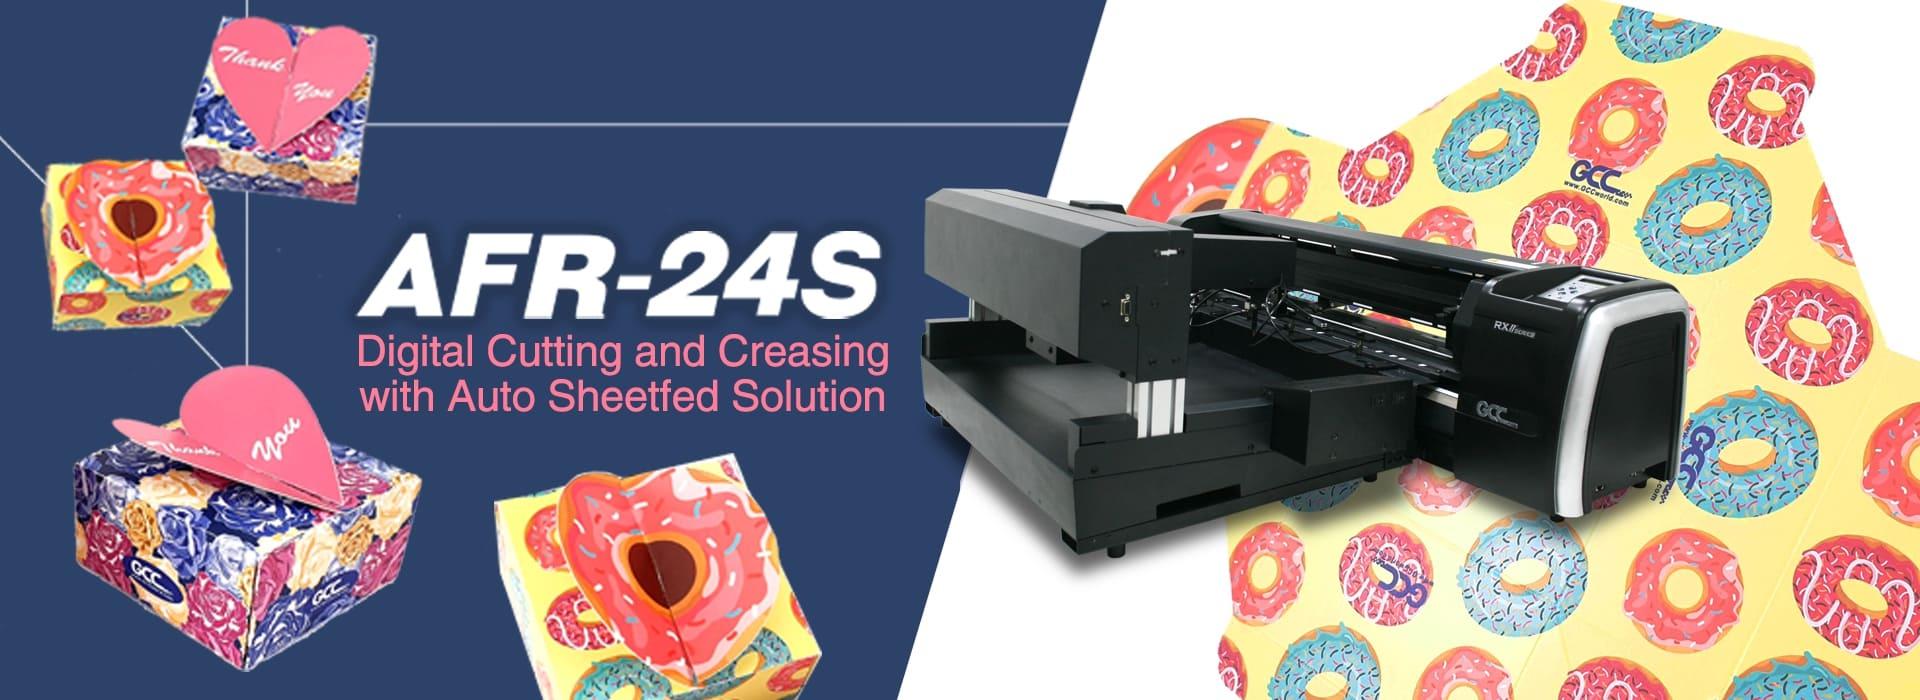 GCC AFR-24S 全自動加工設備優化生產流程